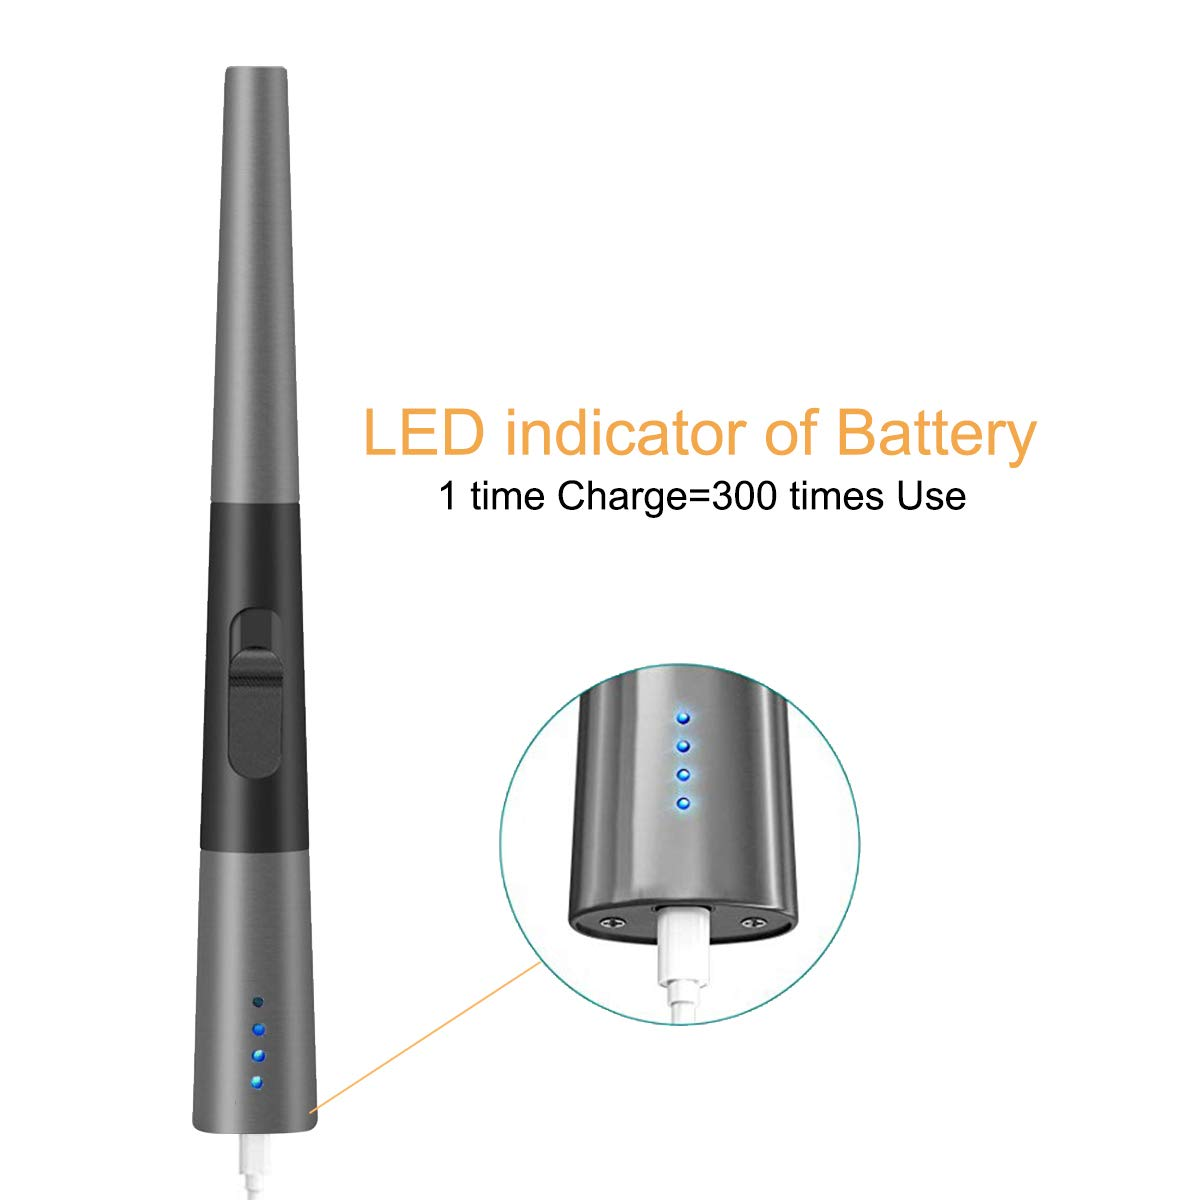 Encendedor de Gas Encendedor Recargable Carga USB con bot/ón de protecci/ón Segura a Prueba de Viento sin Llama para Barbacoa Cocina Gas para cocinas JIAMA Encendedor de Arco el/éctrico